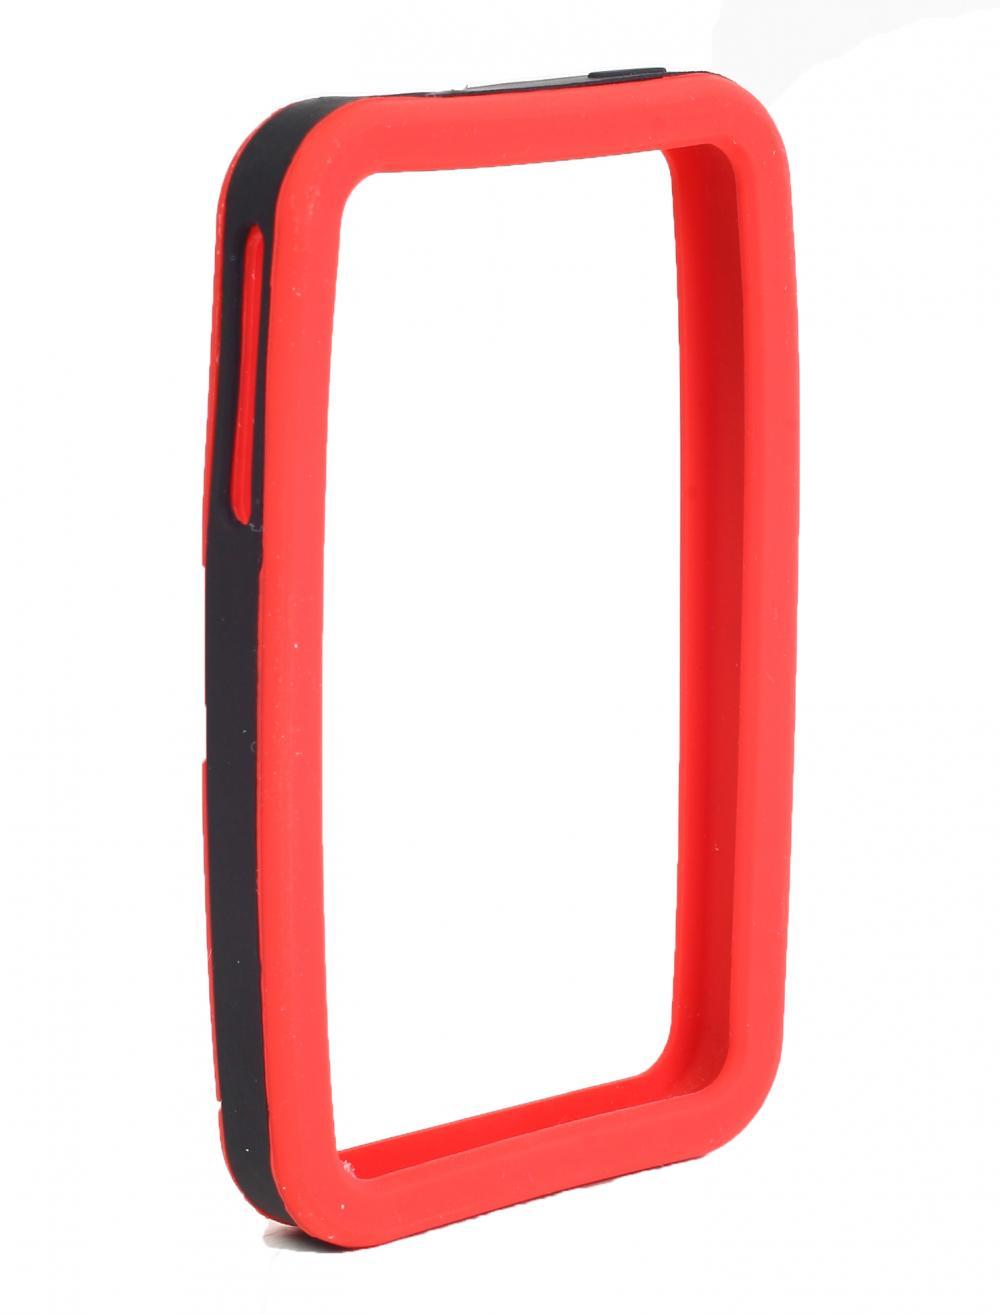 IMPECCA IPS226 Secure Grip Rubber Bumper Frame for iPhone 4GS= <em>Dual Color</em> - Red/Black